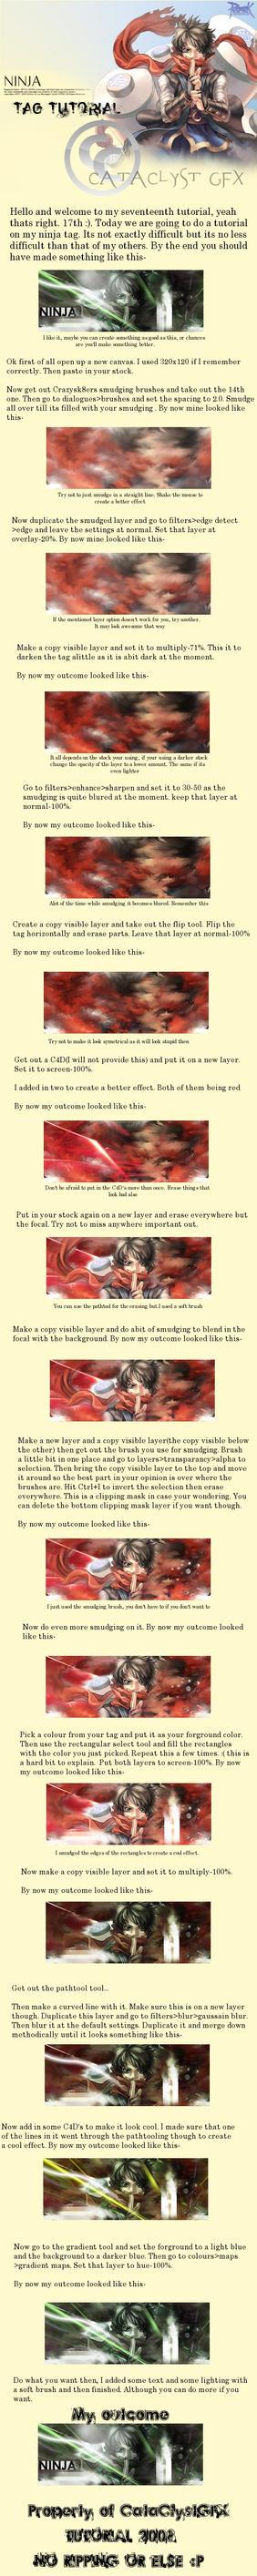 -GIMP- Ninja tag tutorial by zenron